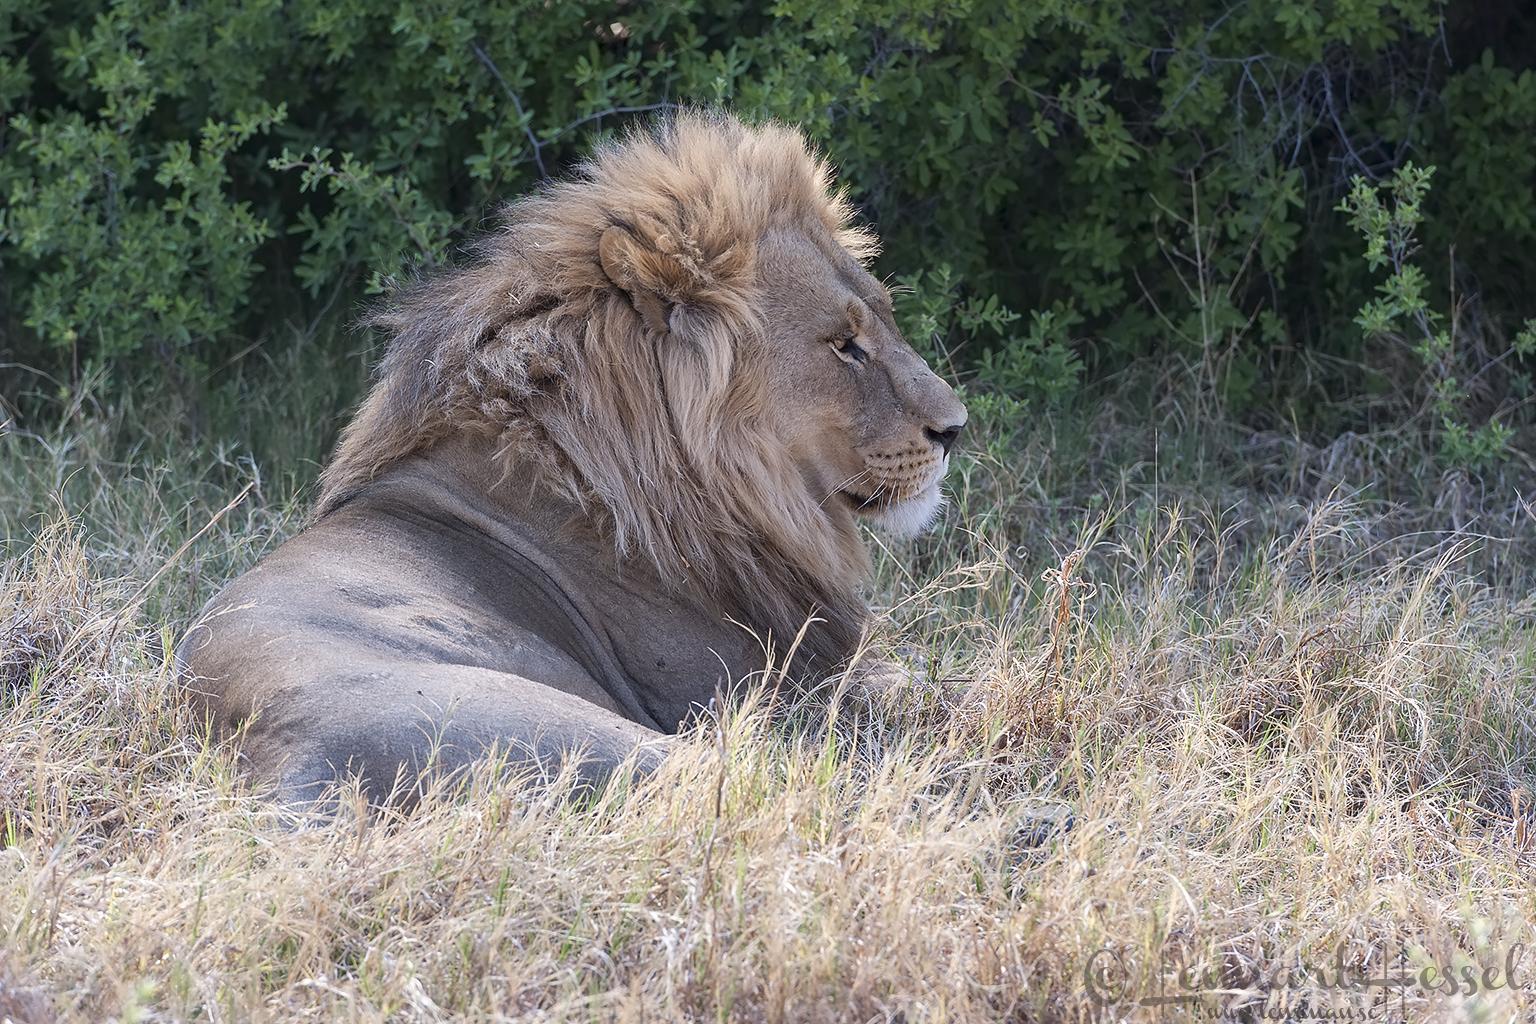 Lion portrait in Khwai Community Area, Botswana